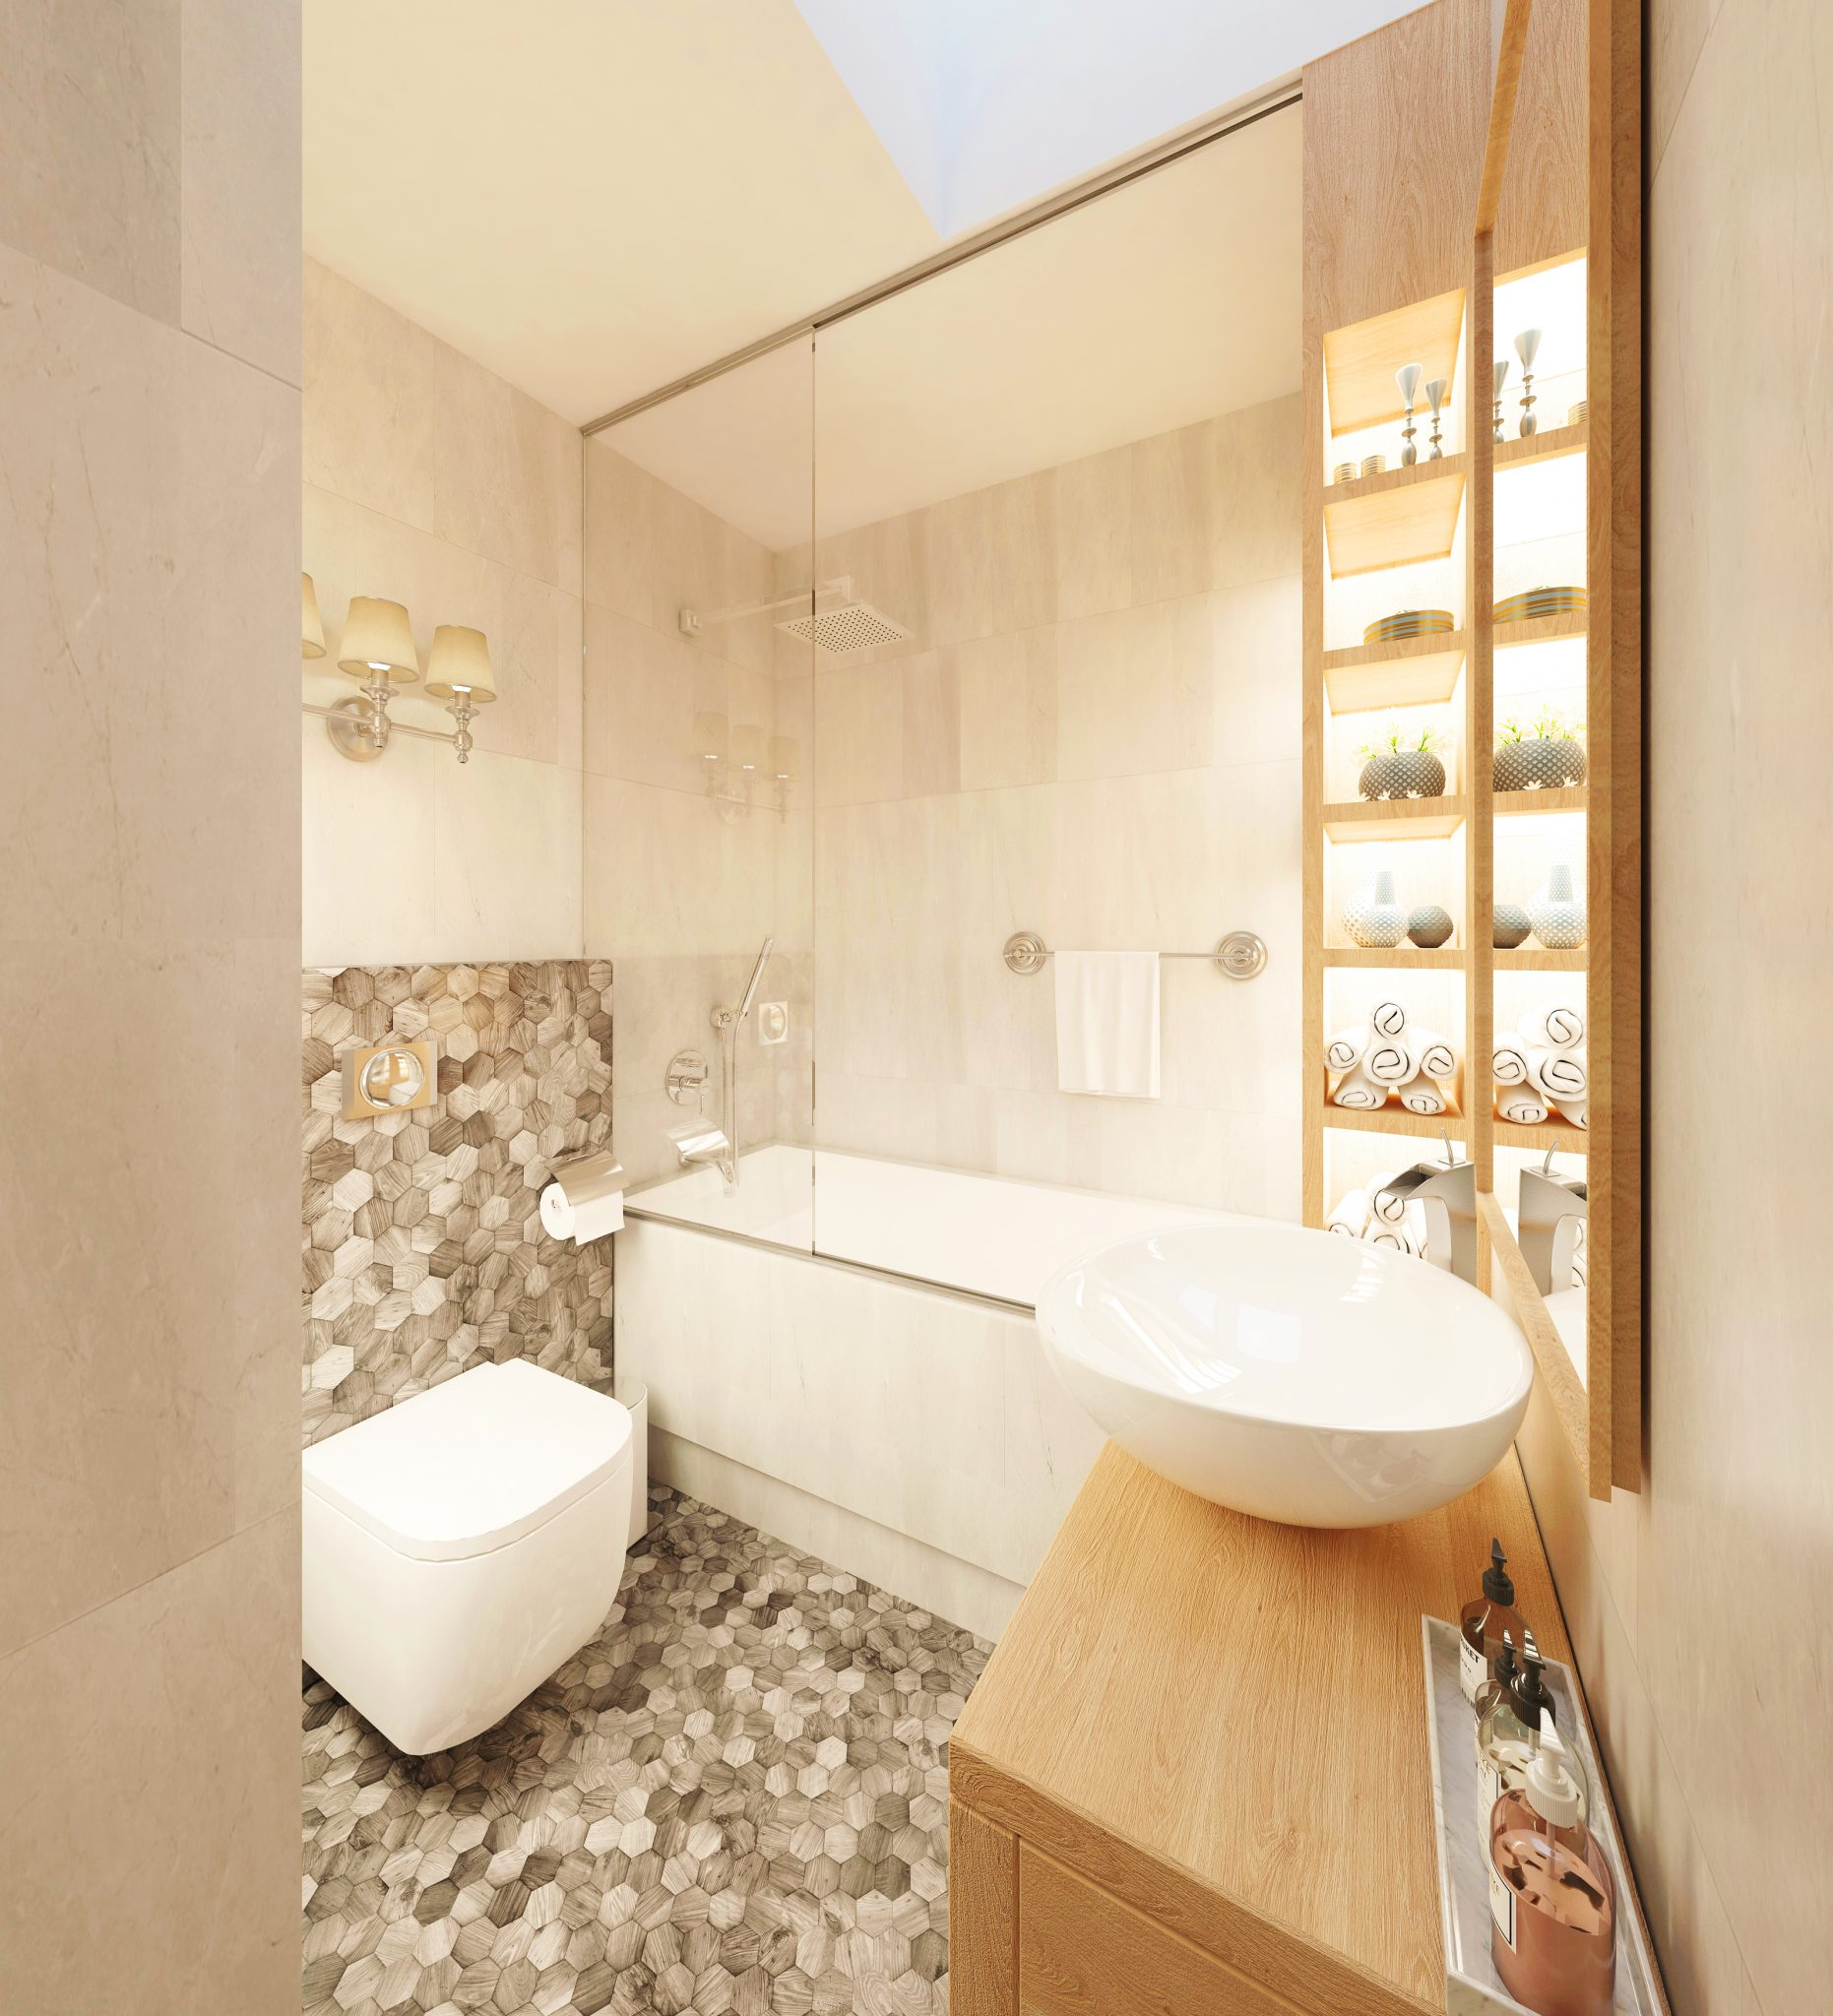 466-Bathroom Visualisation v6